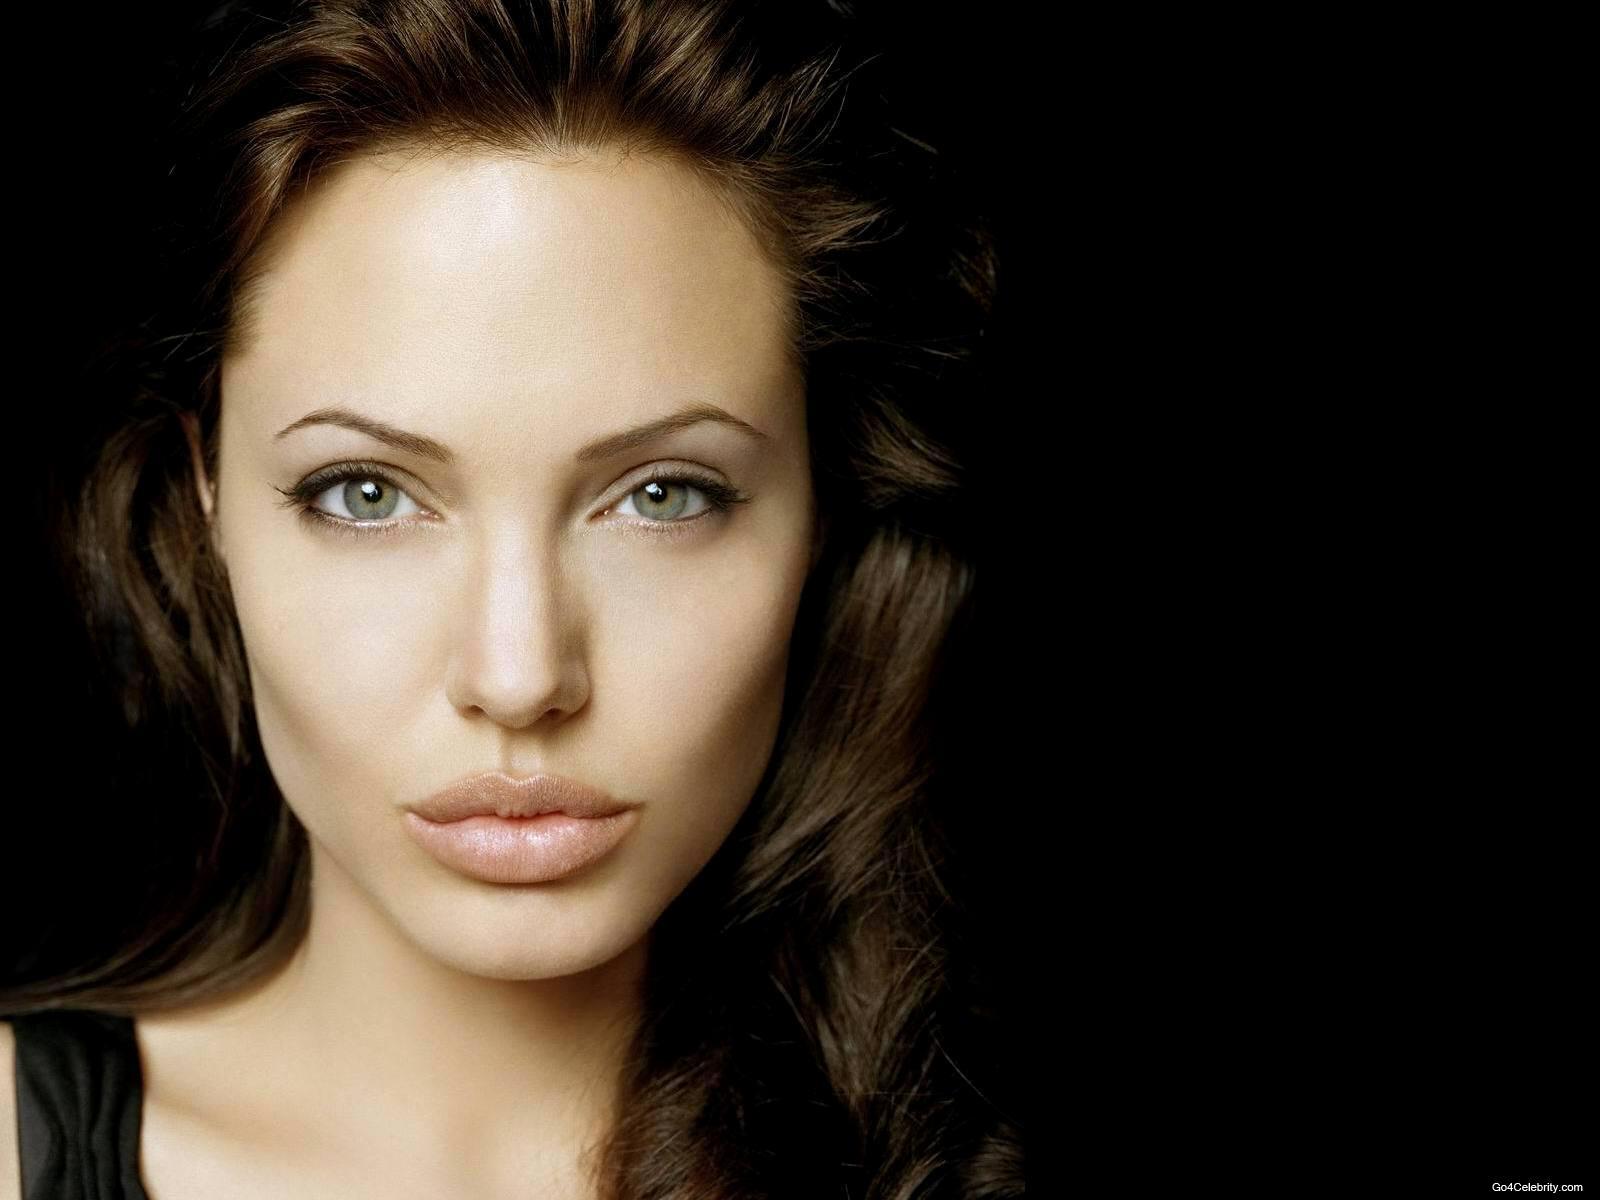 Angelina Jolie 14 Widescreen Wallpaper